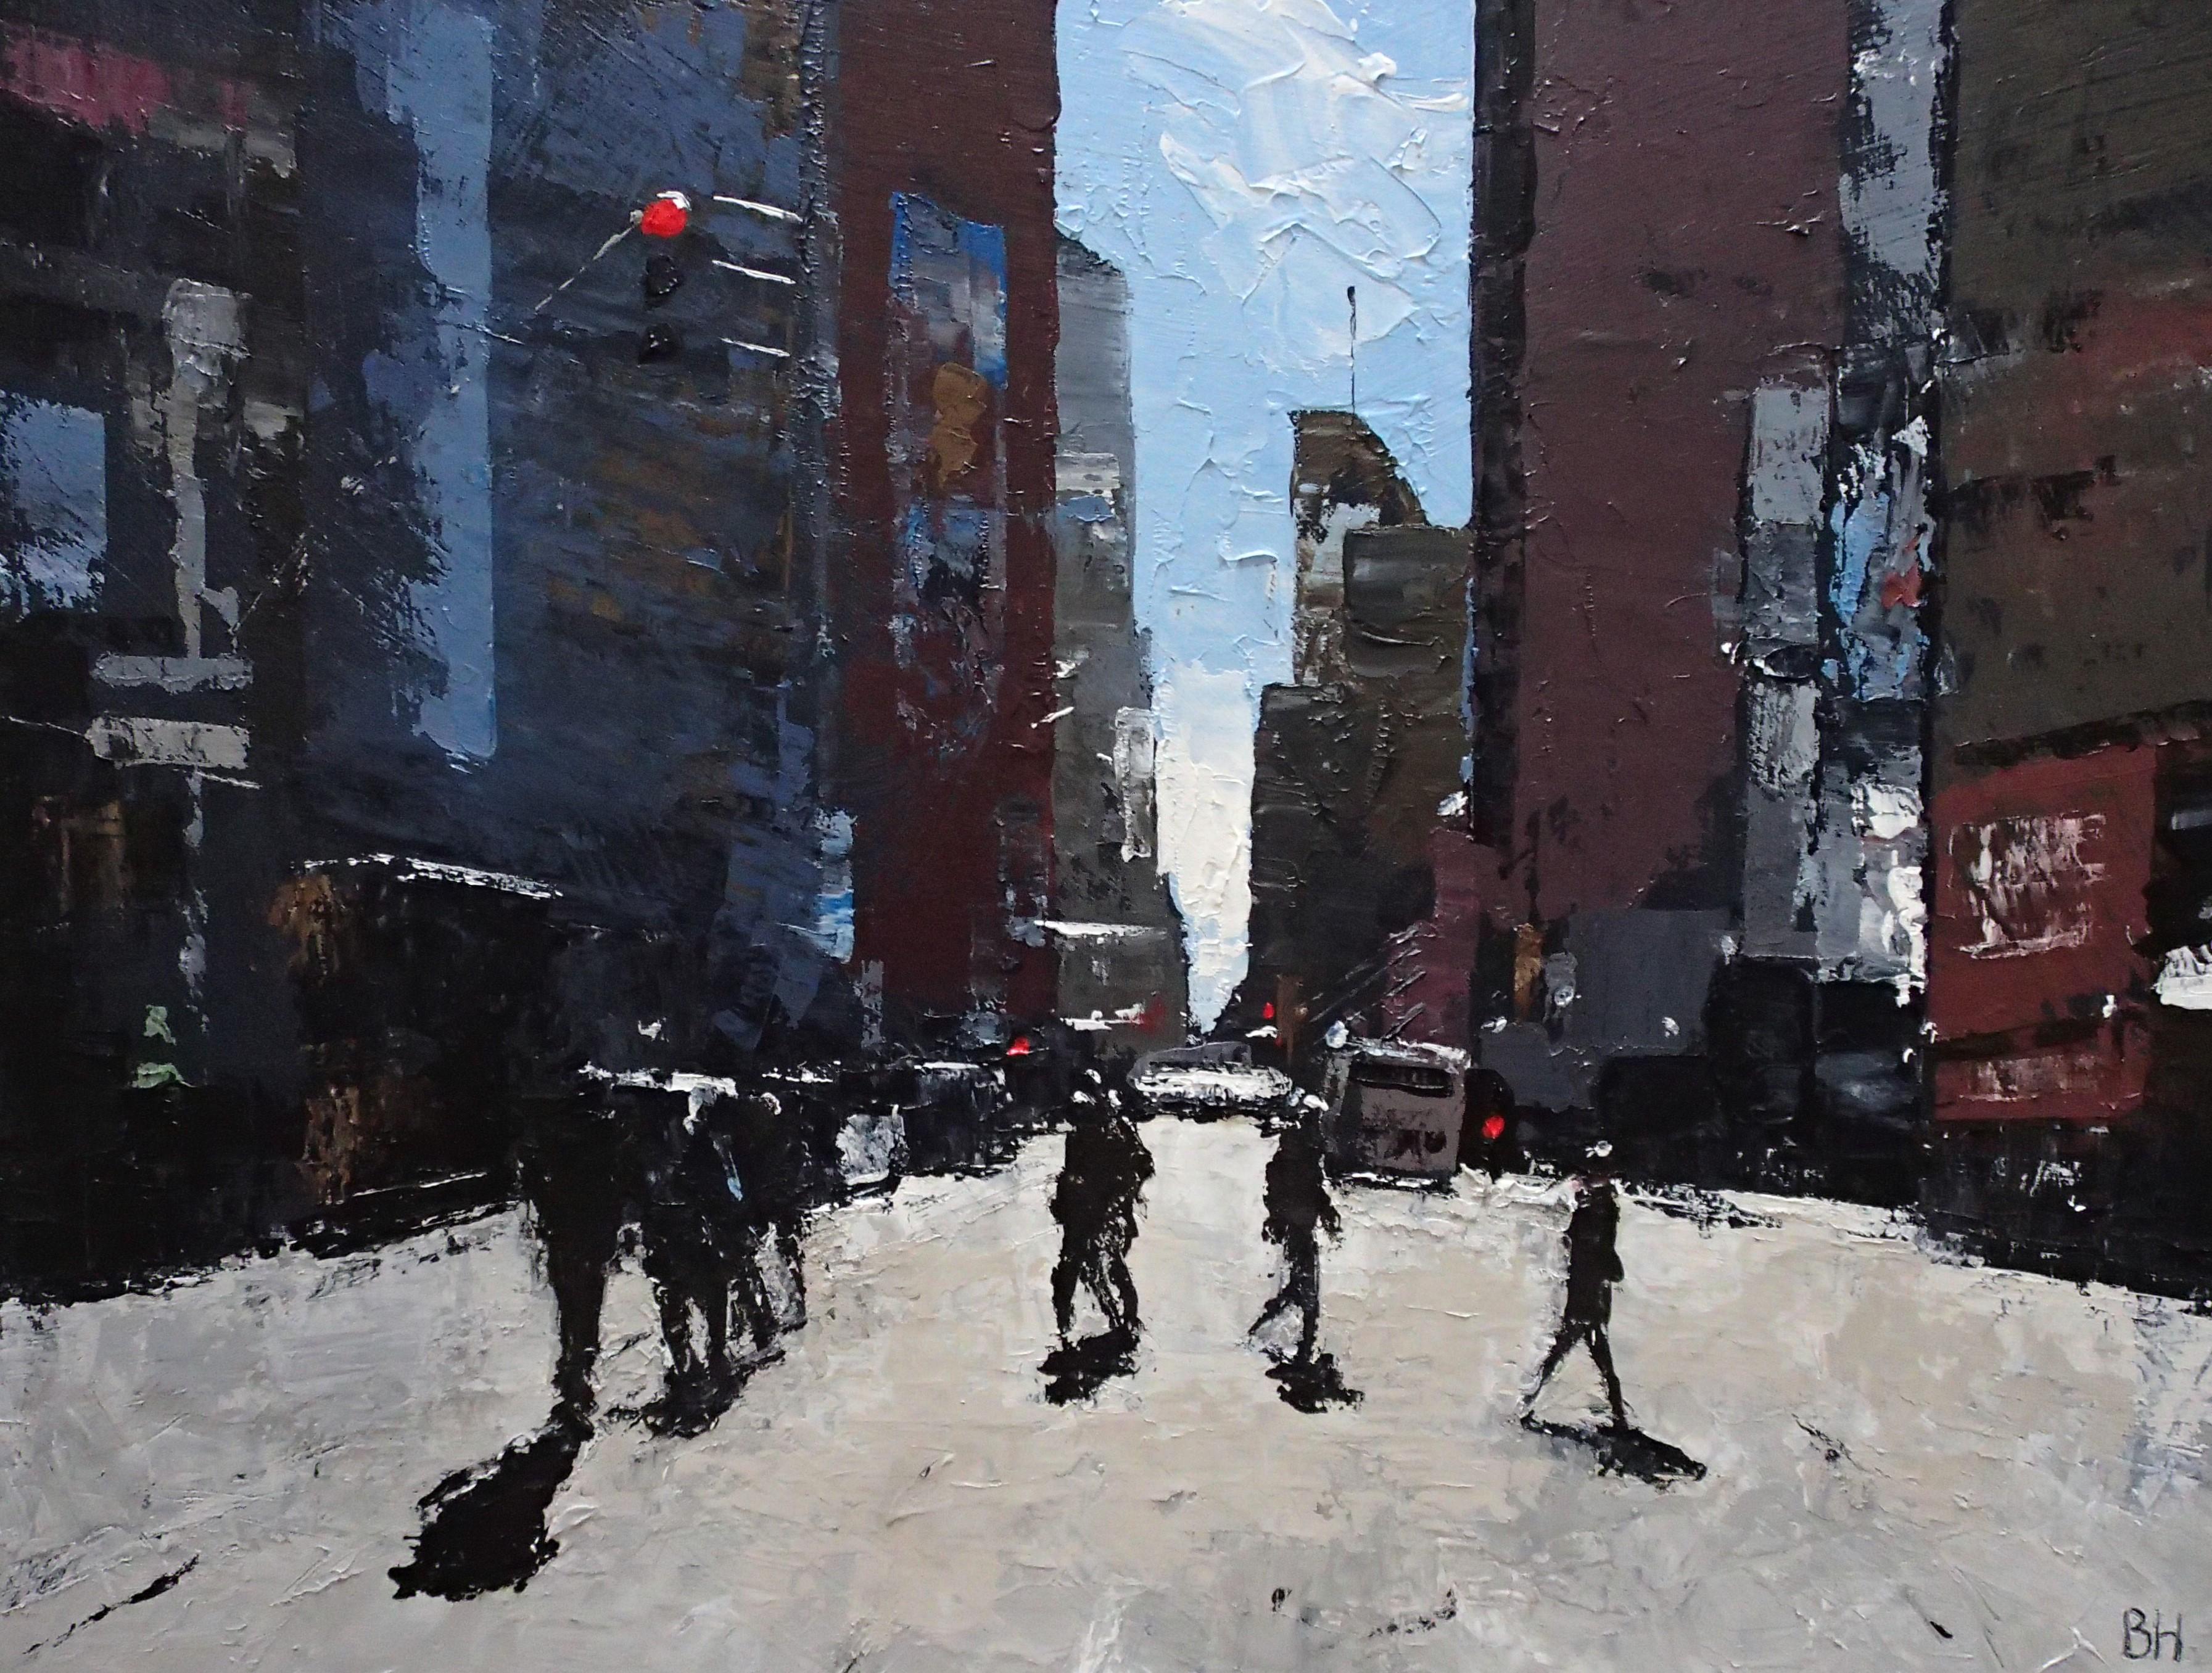 Towards the light - New York City,